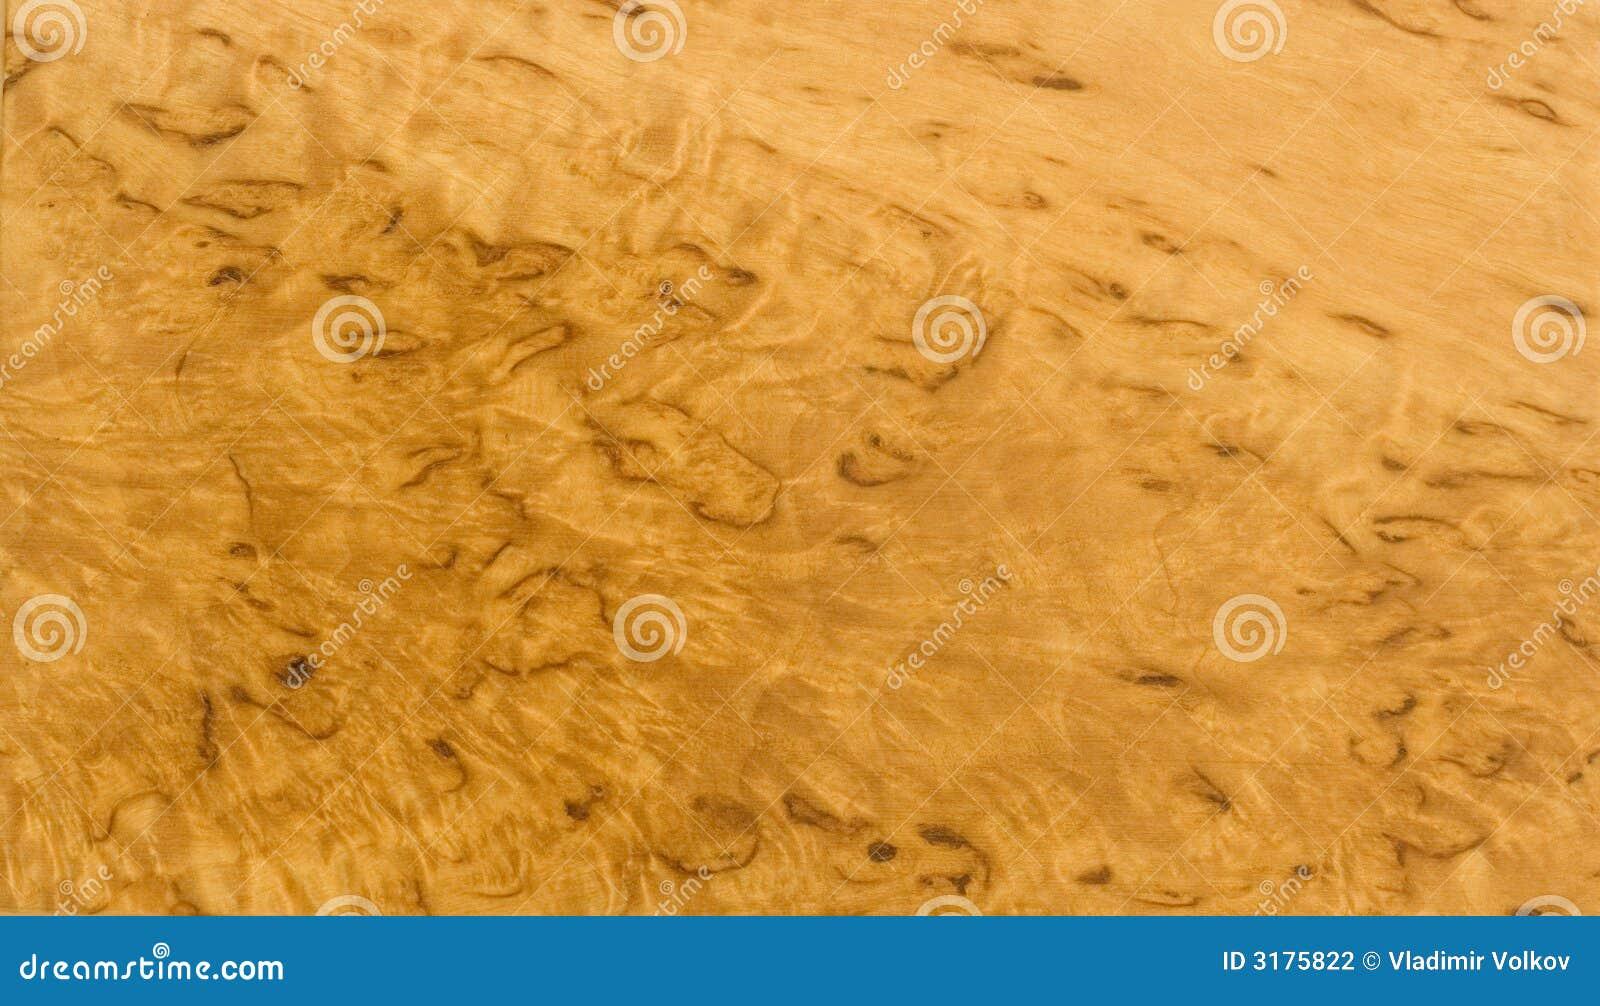 Karelian birch: description, photo 37